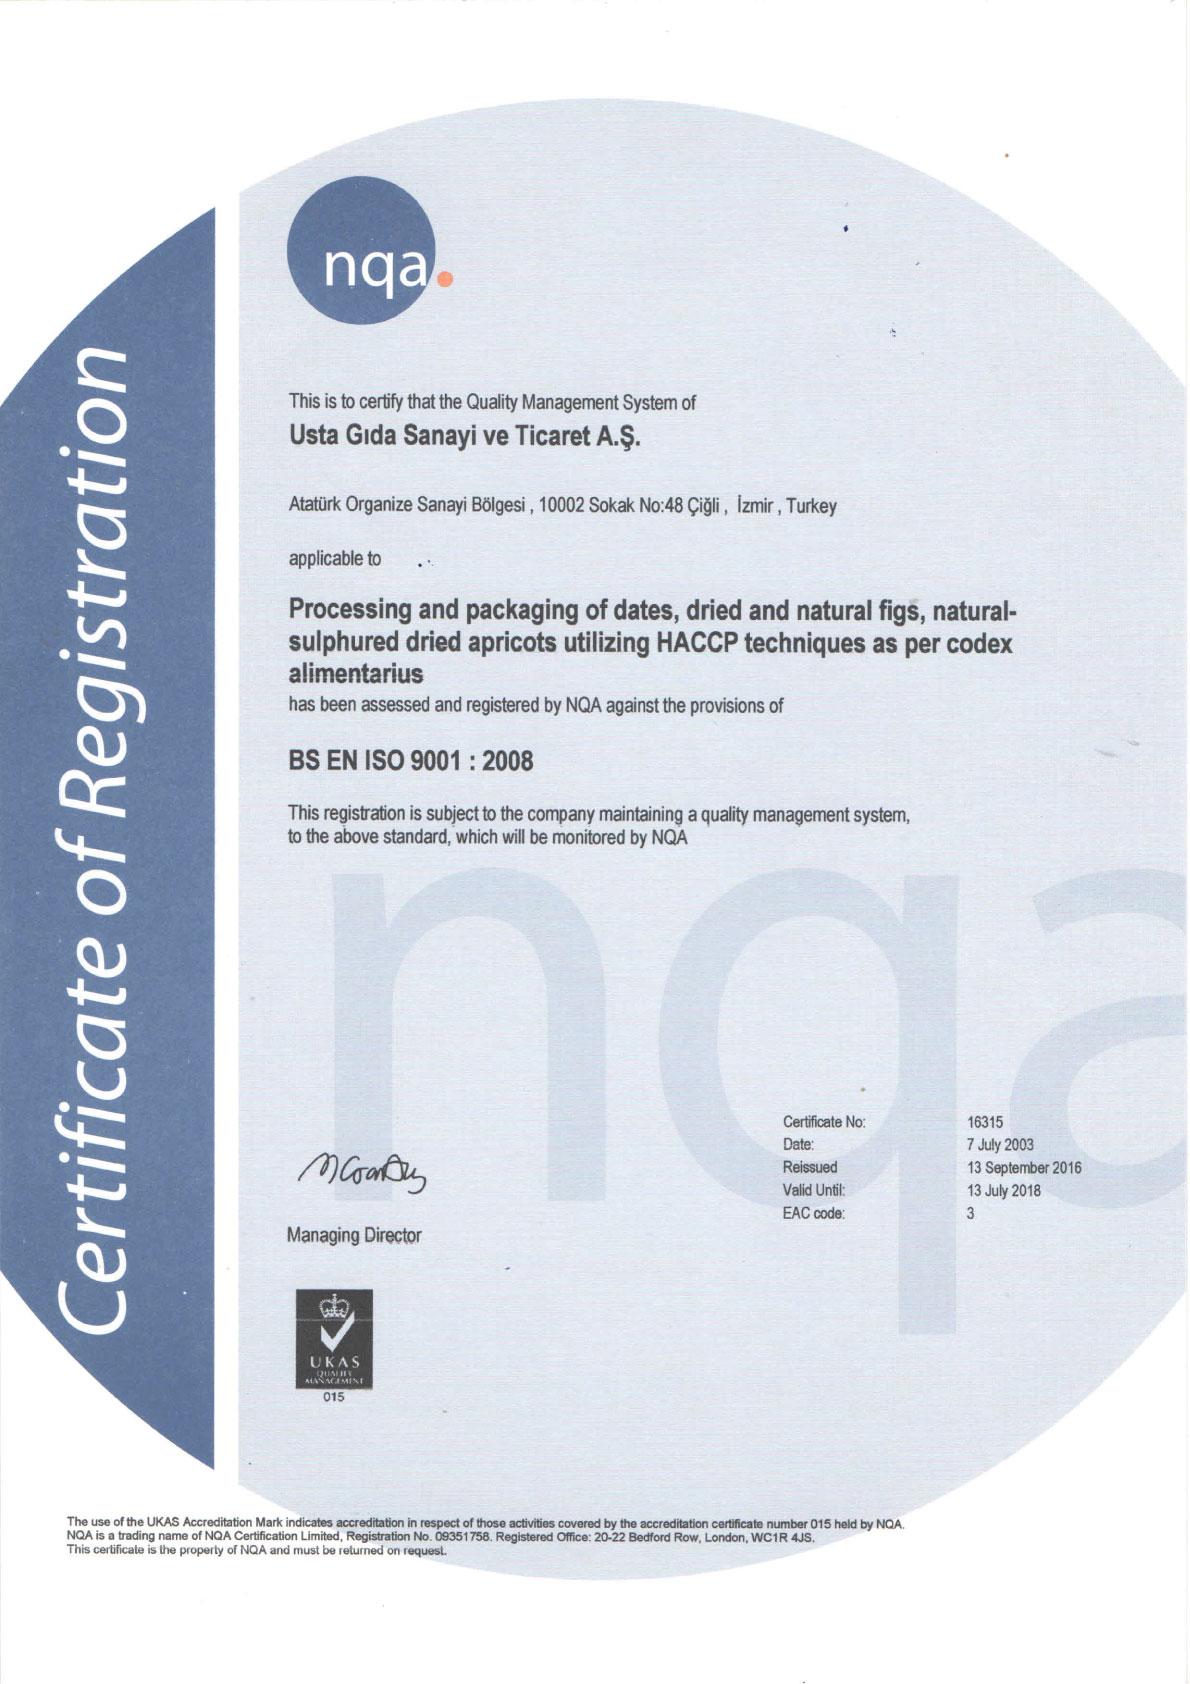 Certificate of Registration - Usta Food Industry Agricultural